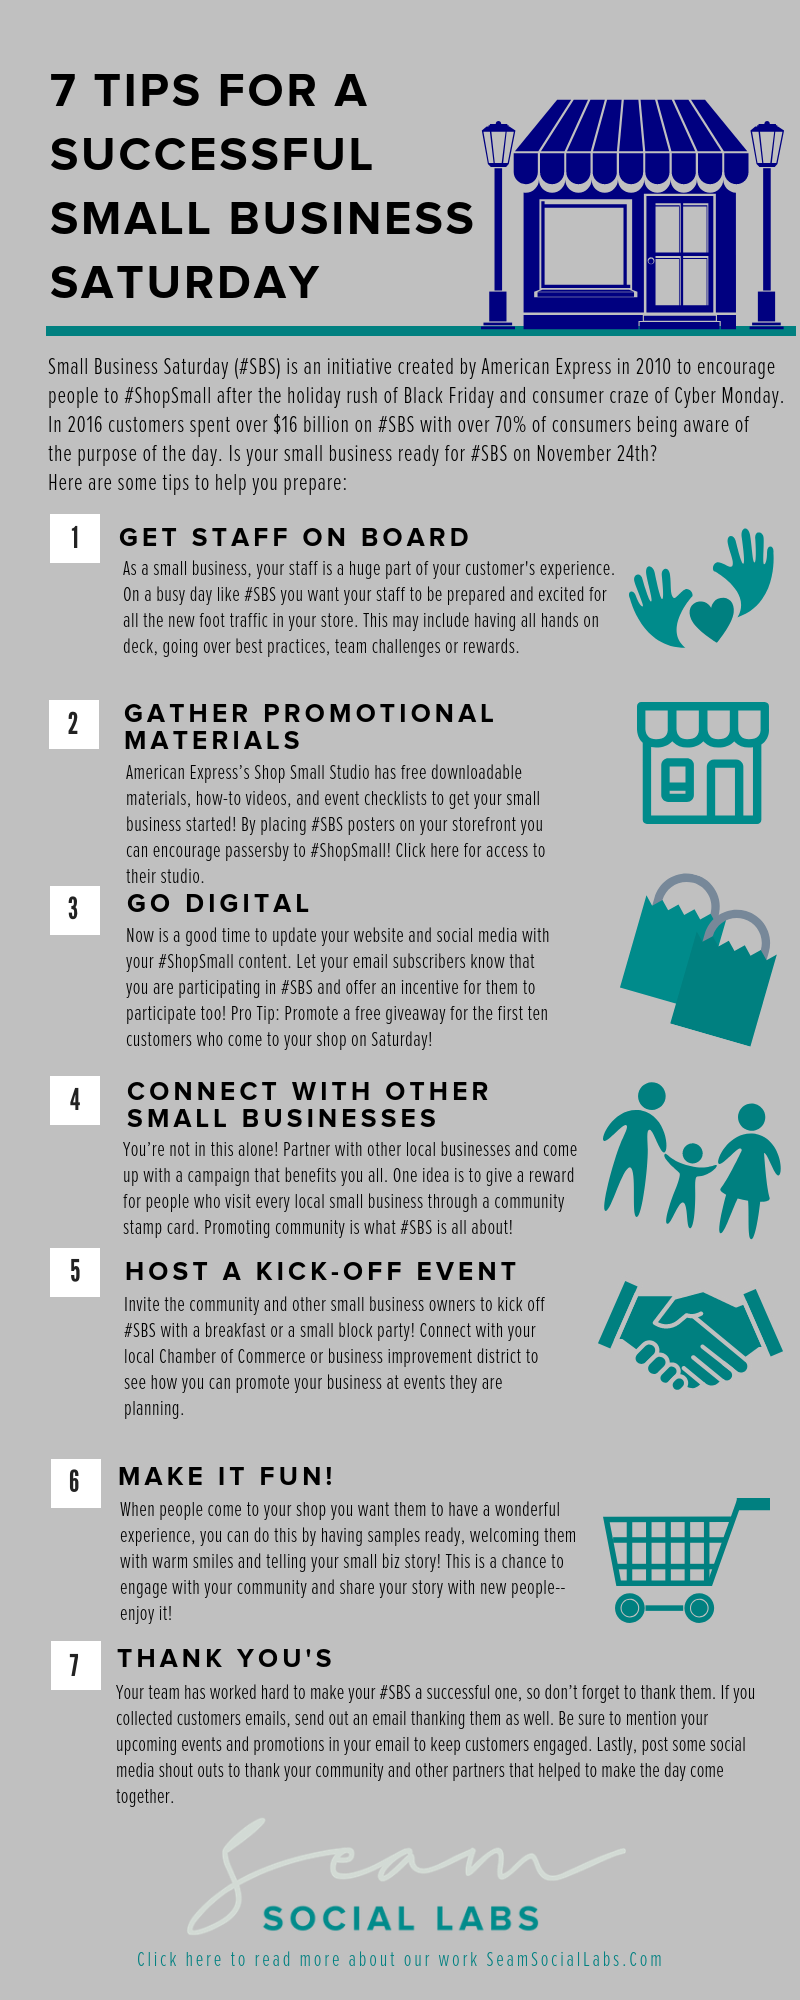 Seam-Social-Labs-Tipsheet-Small-Business-Saturday.png